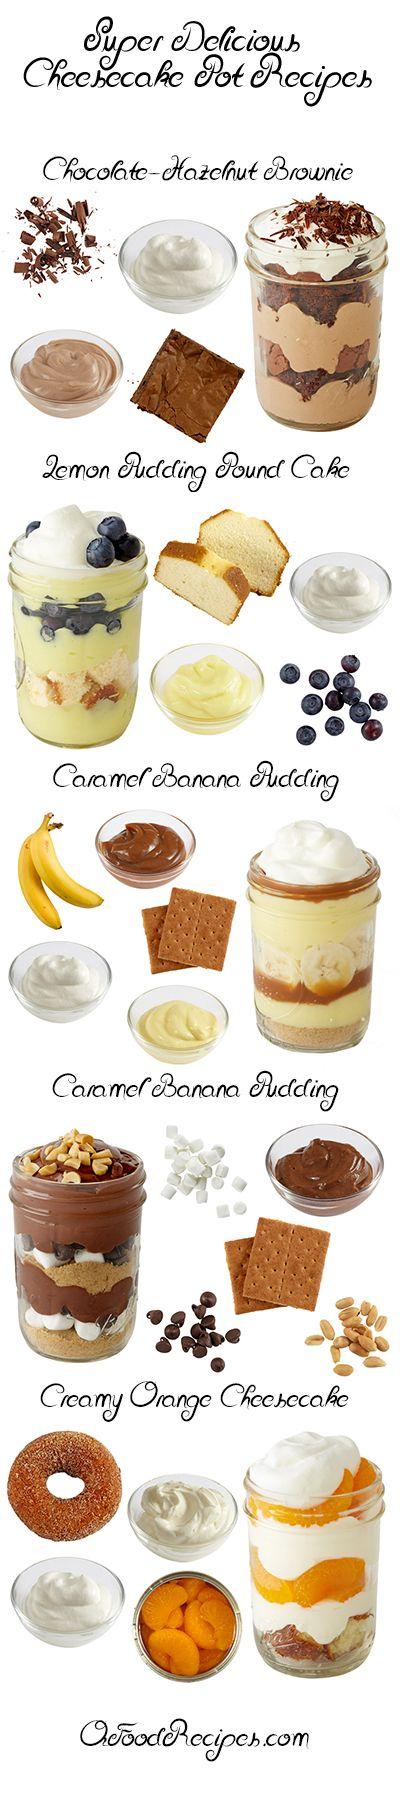 100 Dessert In A Mason Jar Ideas Dessert In A Jar Dessert Recipes Delicious Desserts